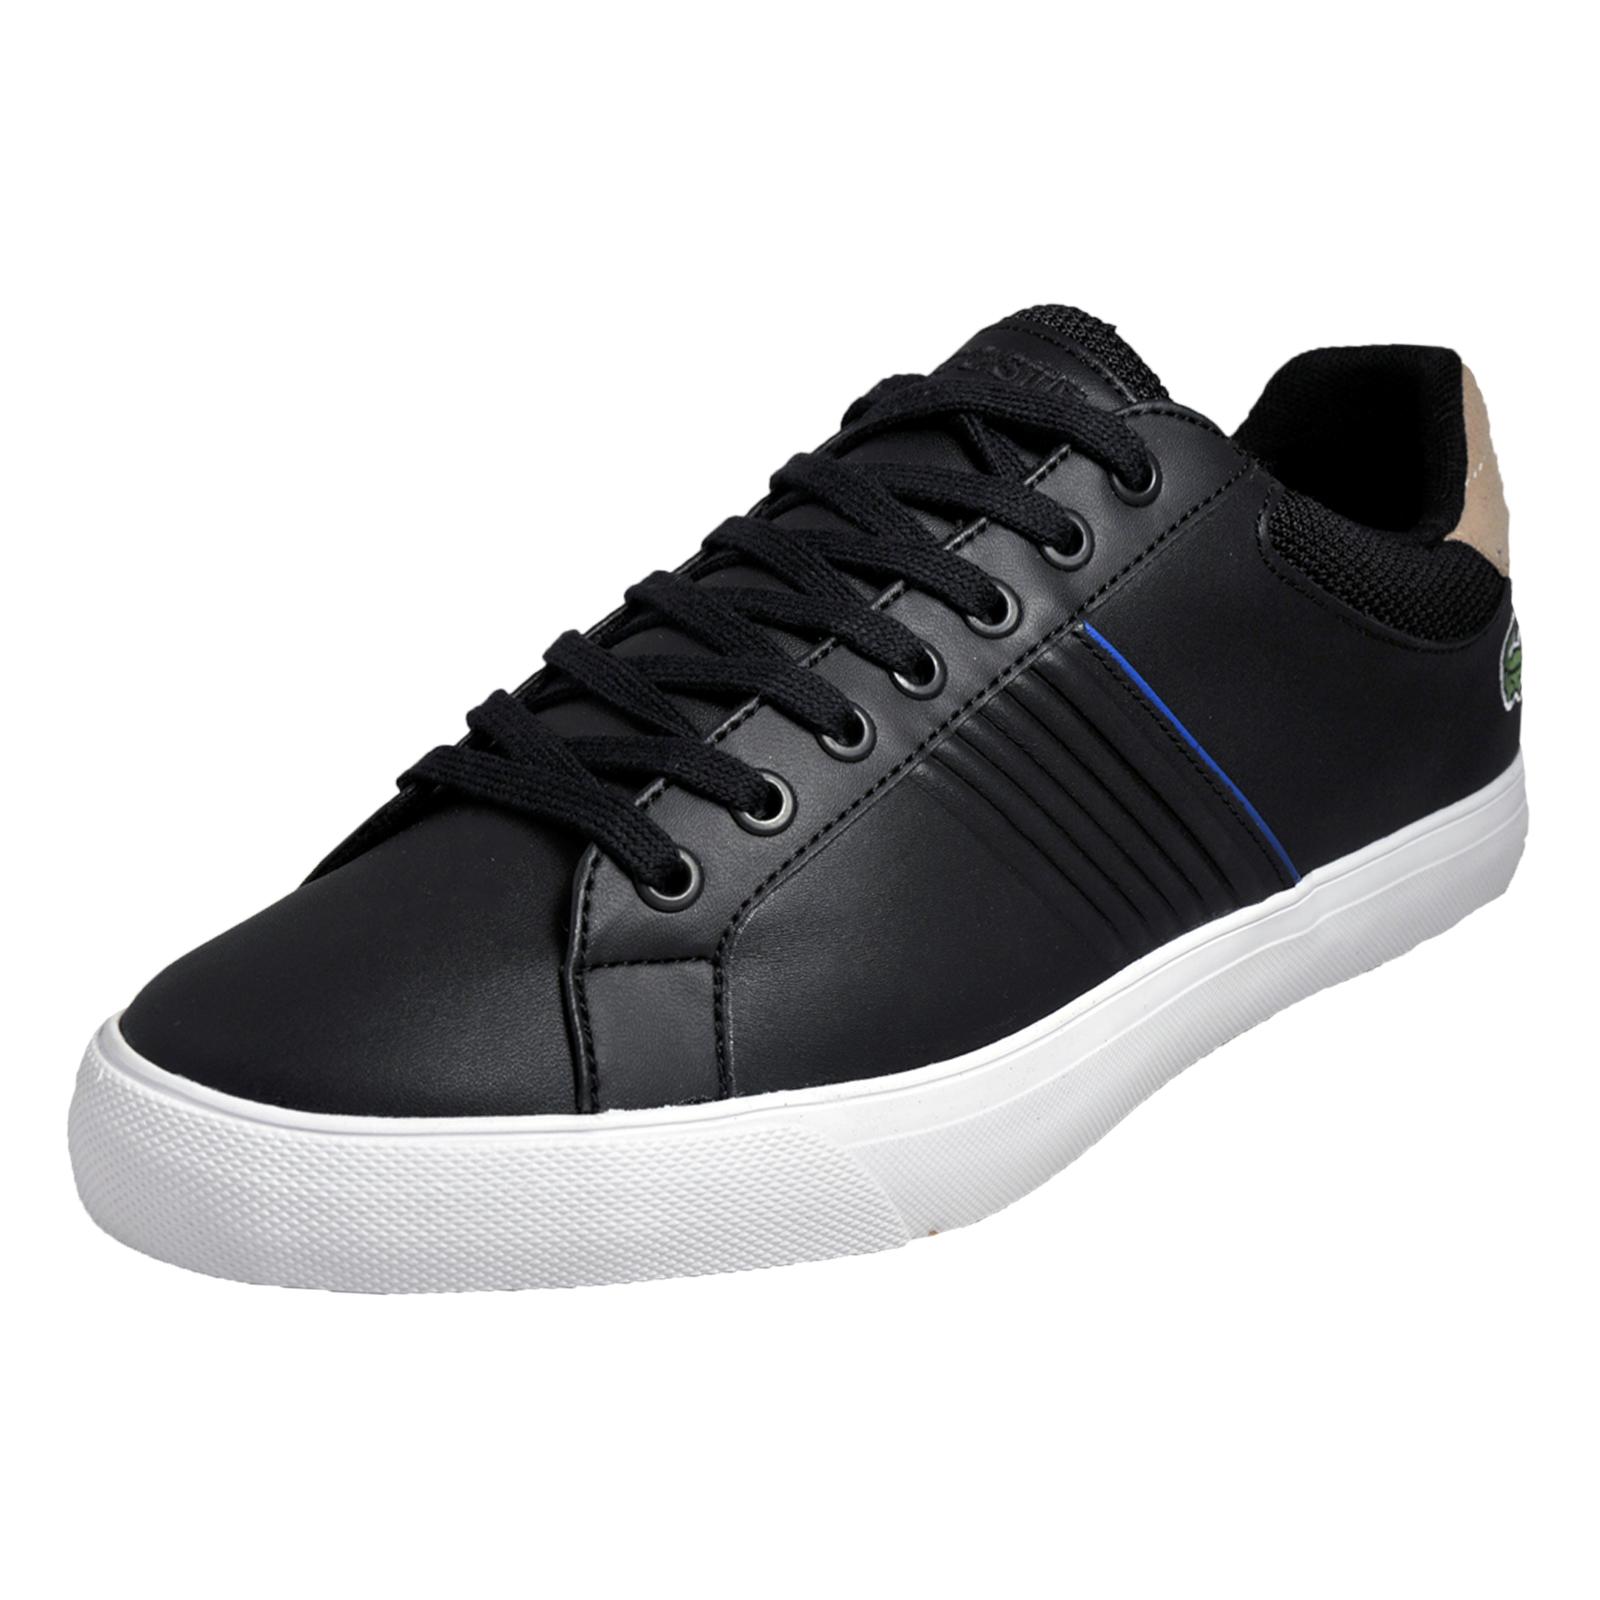 cd0c9df99 Details about Lacoste Fairlead 117 Mens Designer Leather Classic Casual  Trainers Black